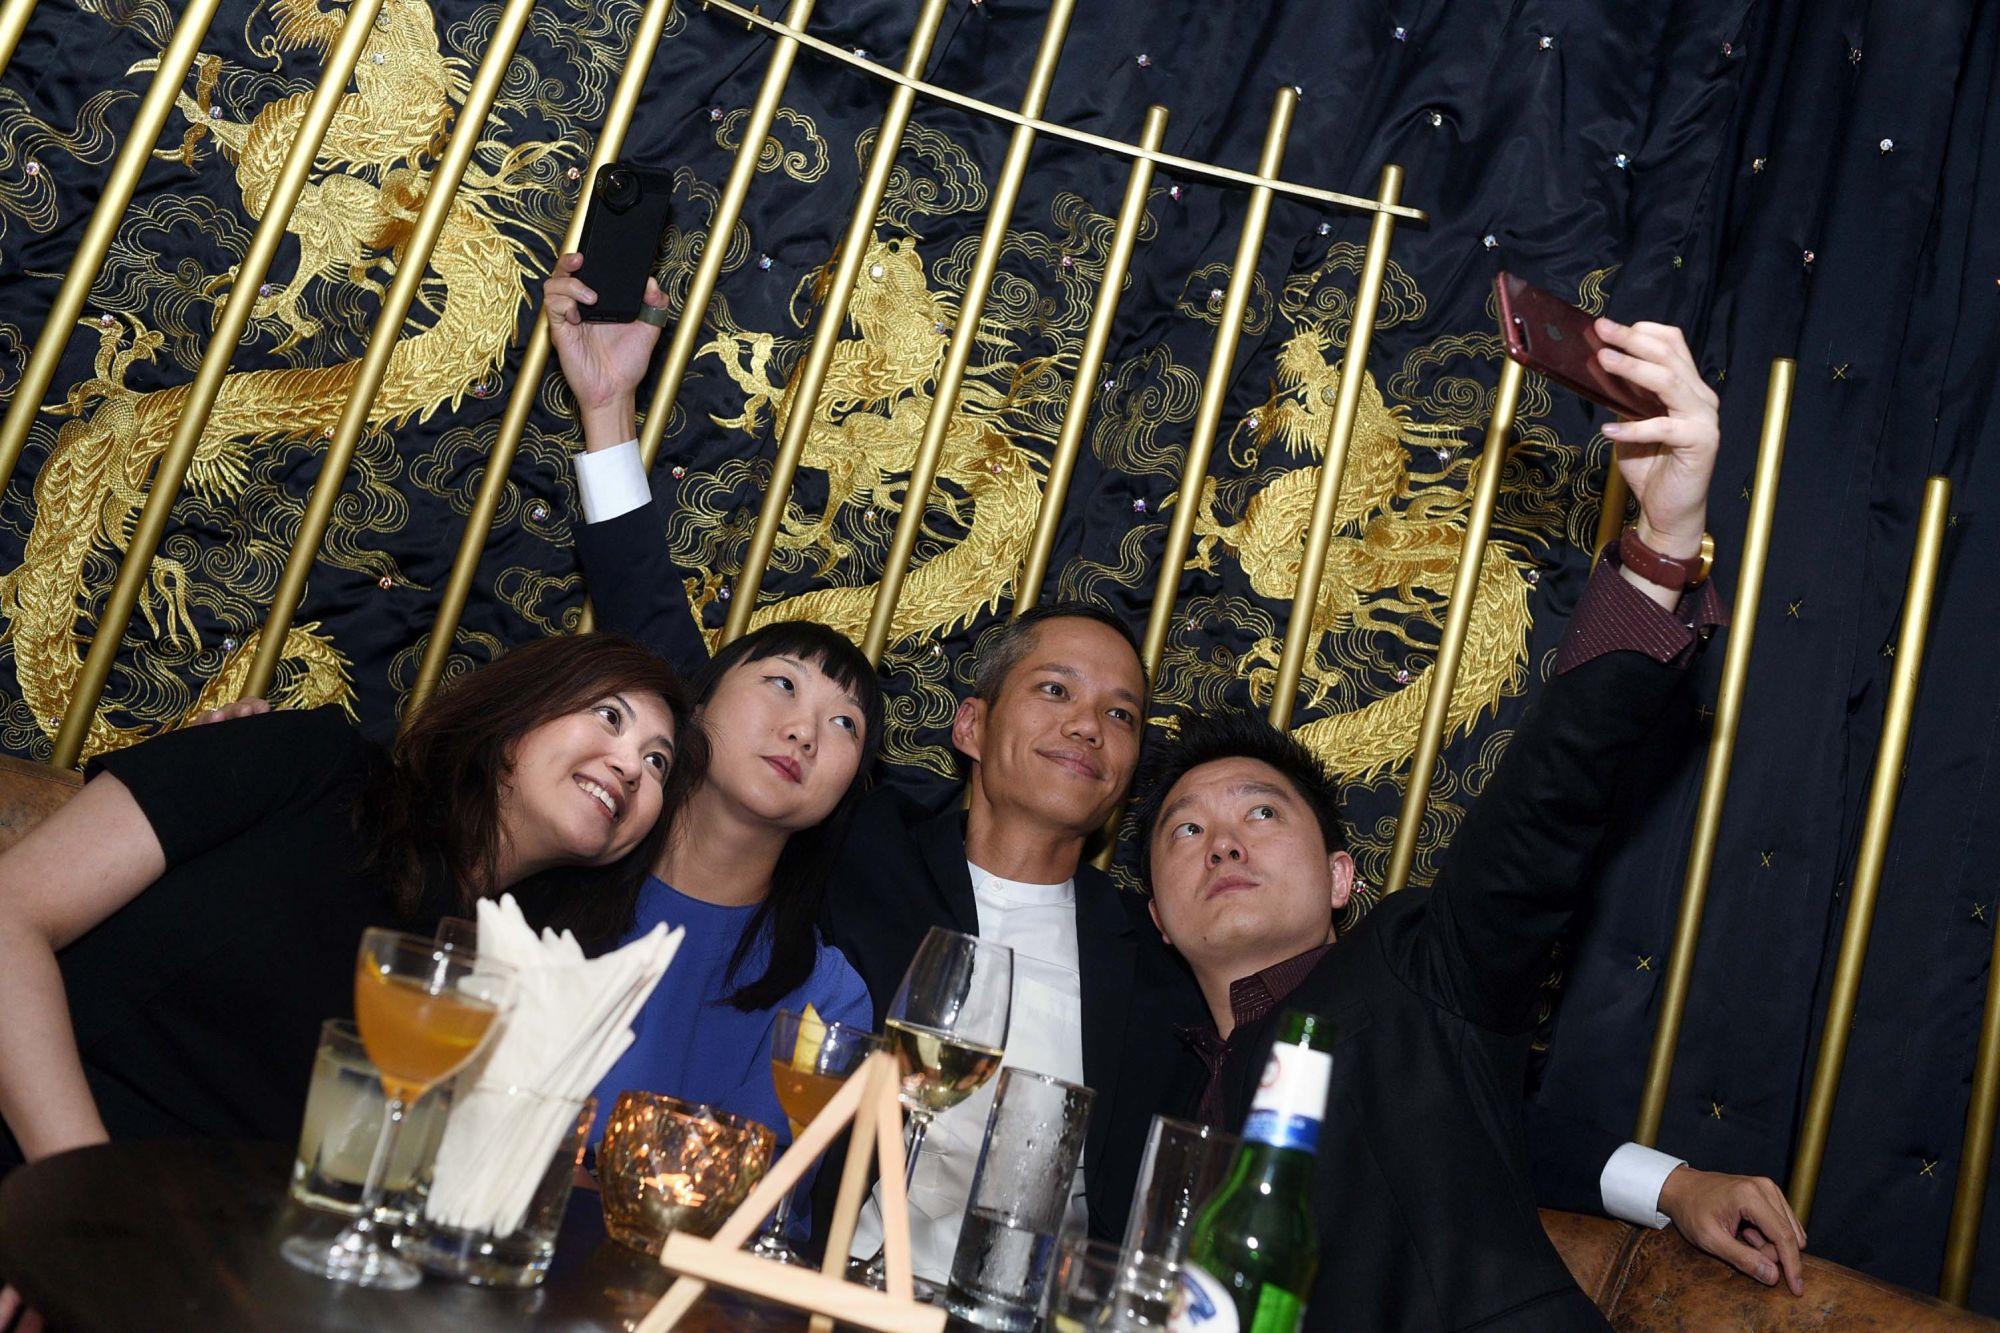 Kee Wei Hui, Oliva Lee, Hunn Wai, Tan Szue Hann